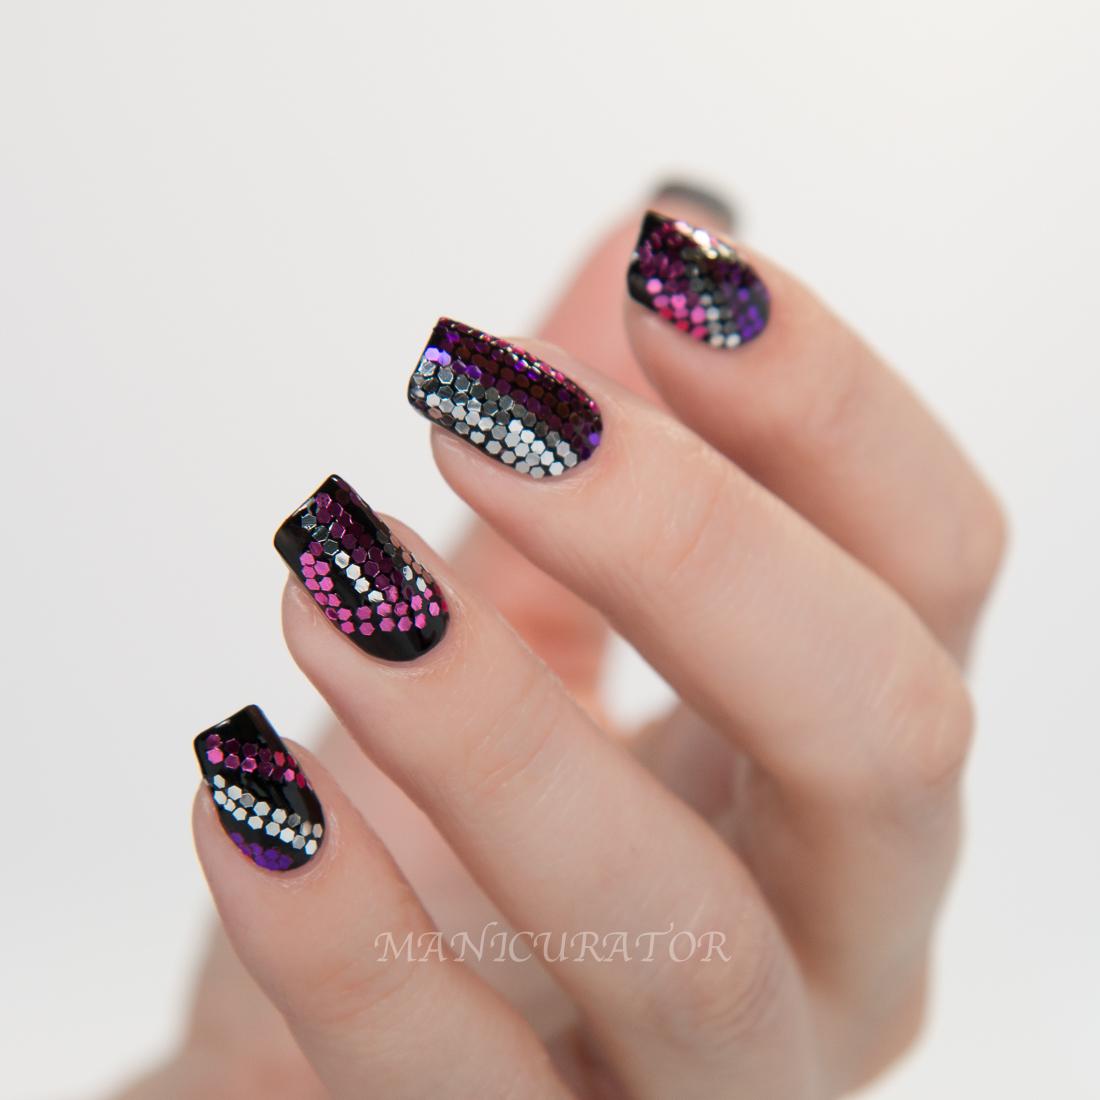 NAFW-Rodarte-Studio-54-glitter-nailart